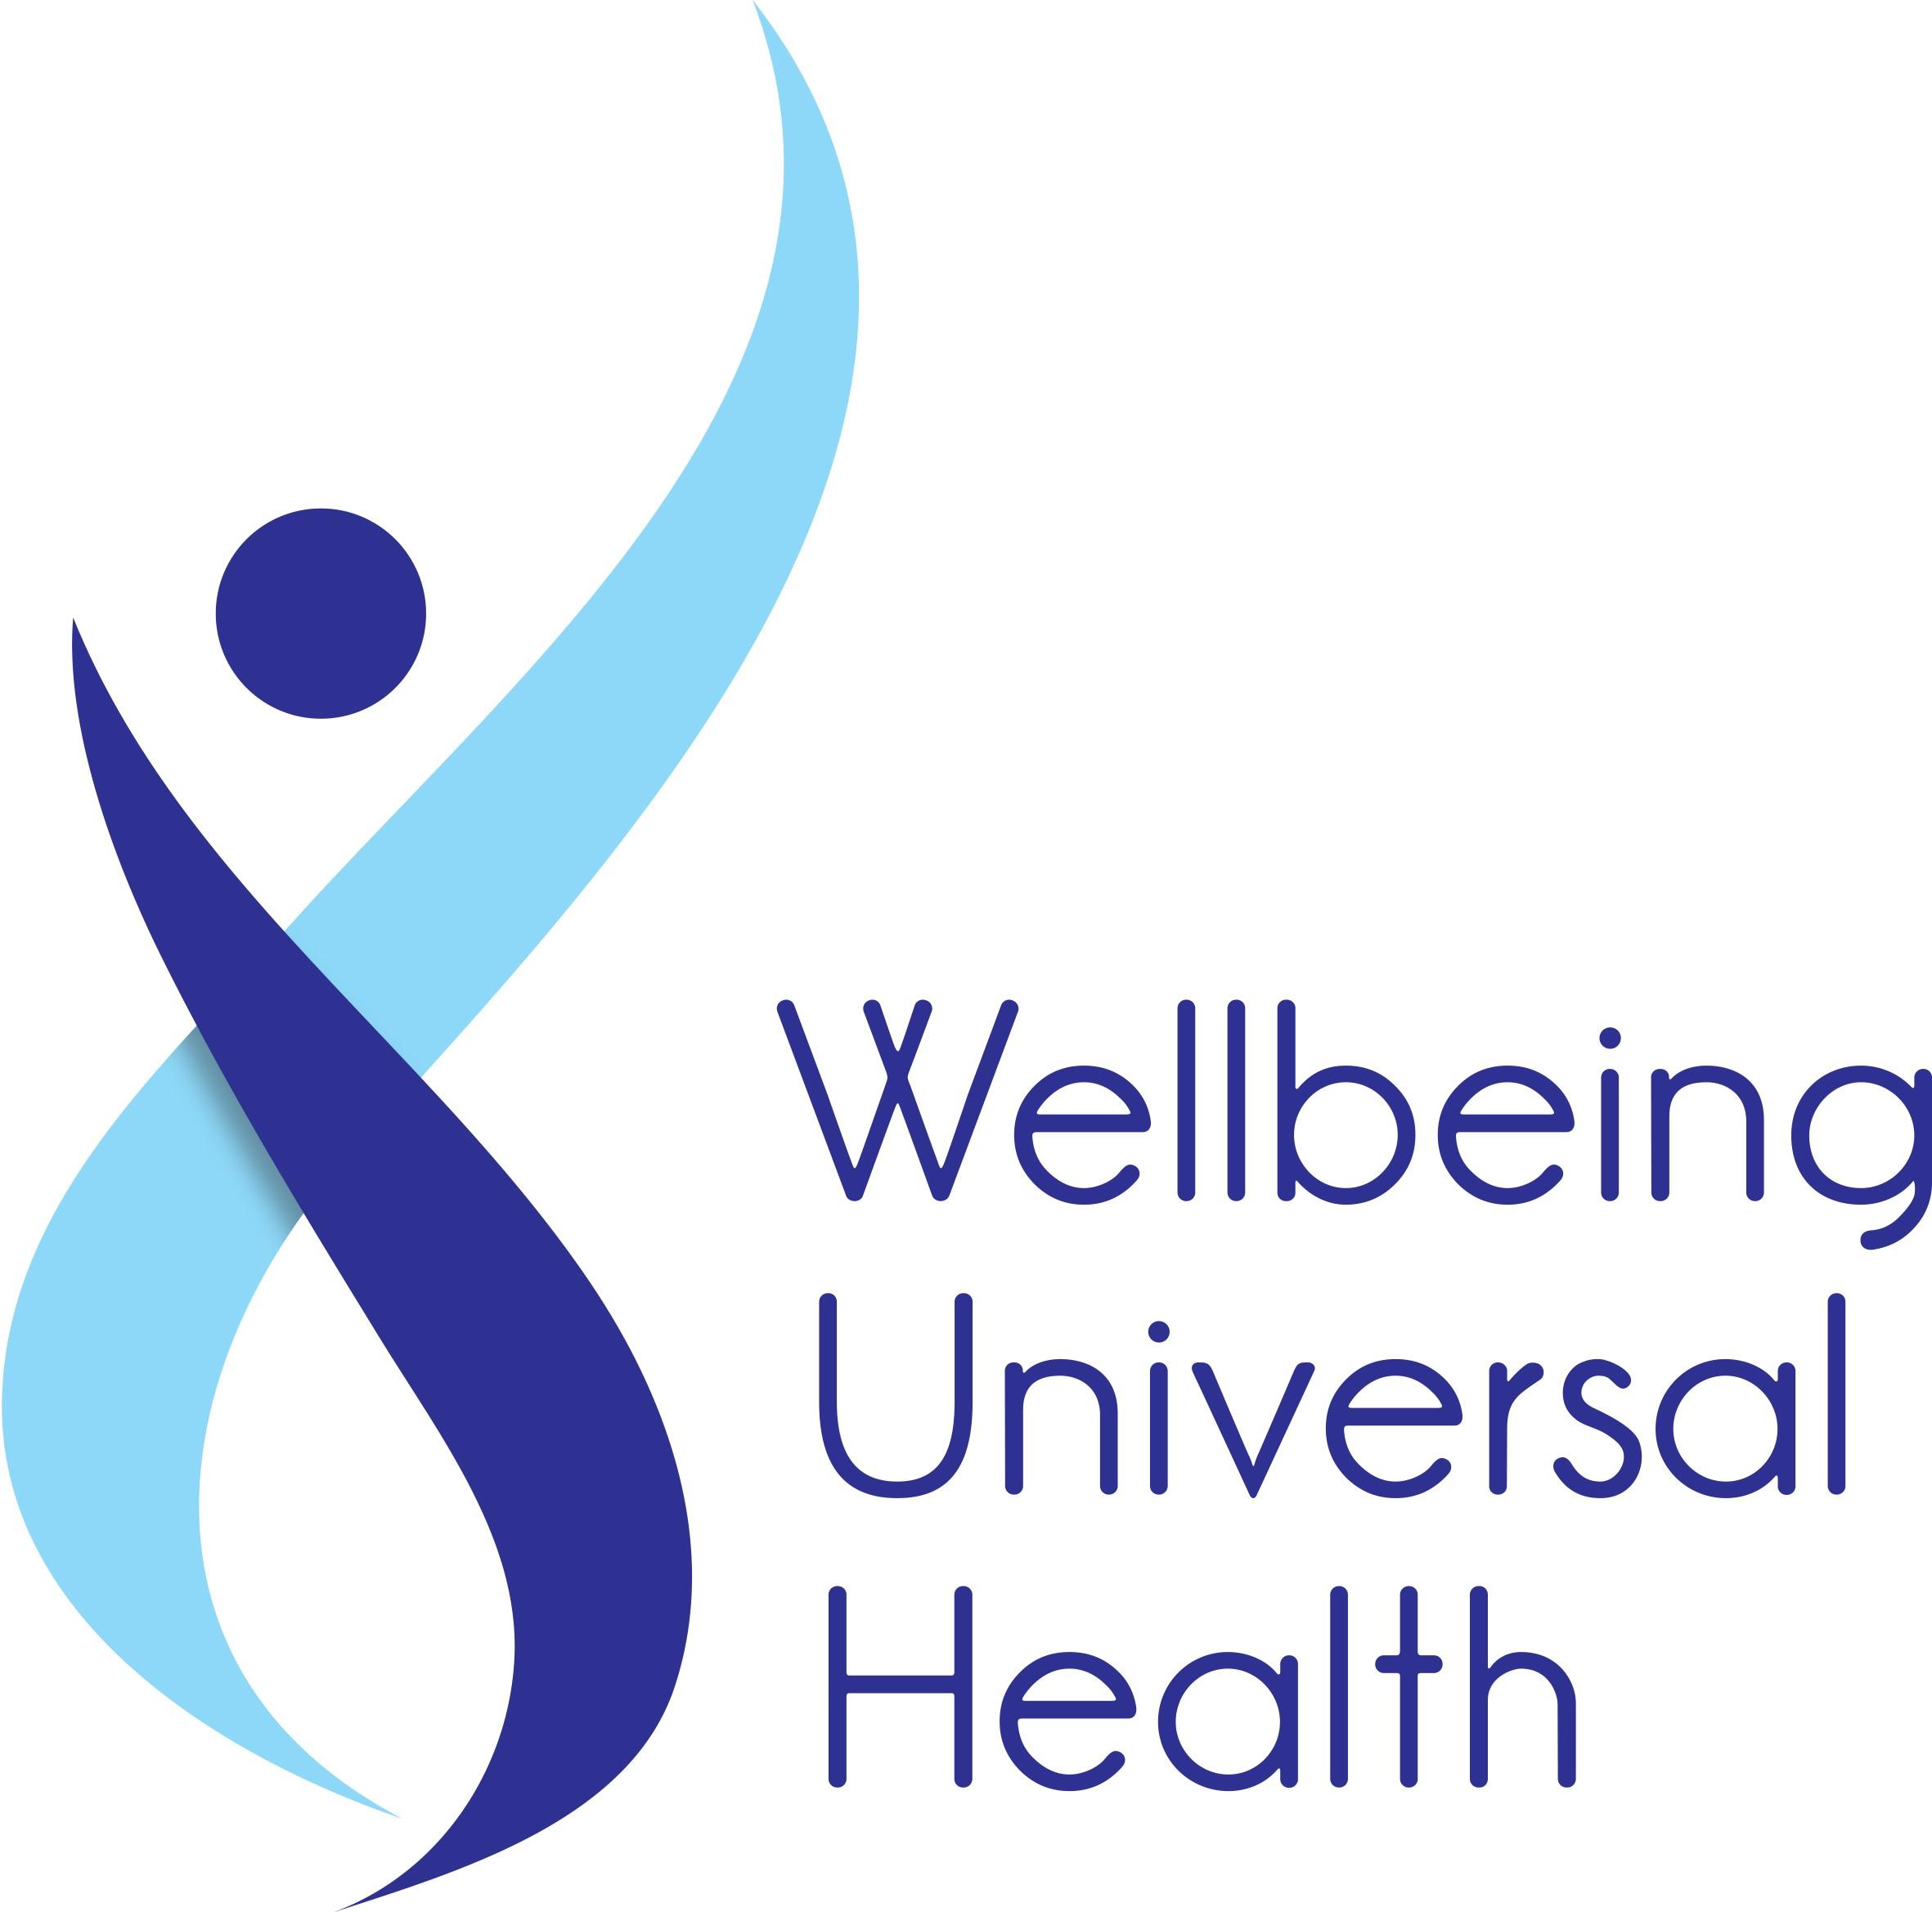 Wellbeing Universal Health